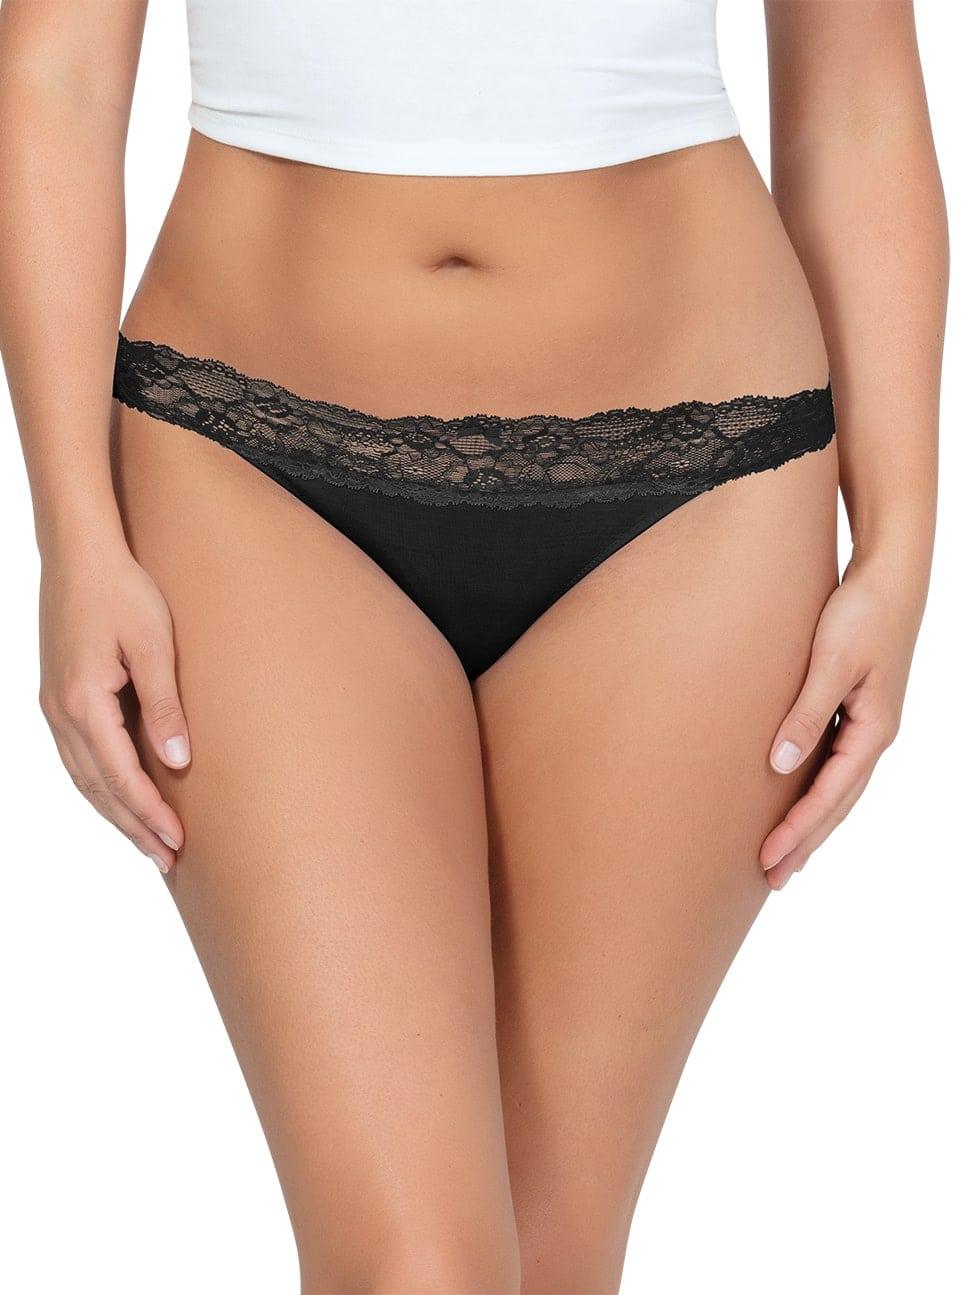 PARFAIT ParfaitPanty SoEssential ThongPP403 Black Front - Panty So Essential Thong - Black - PP403